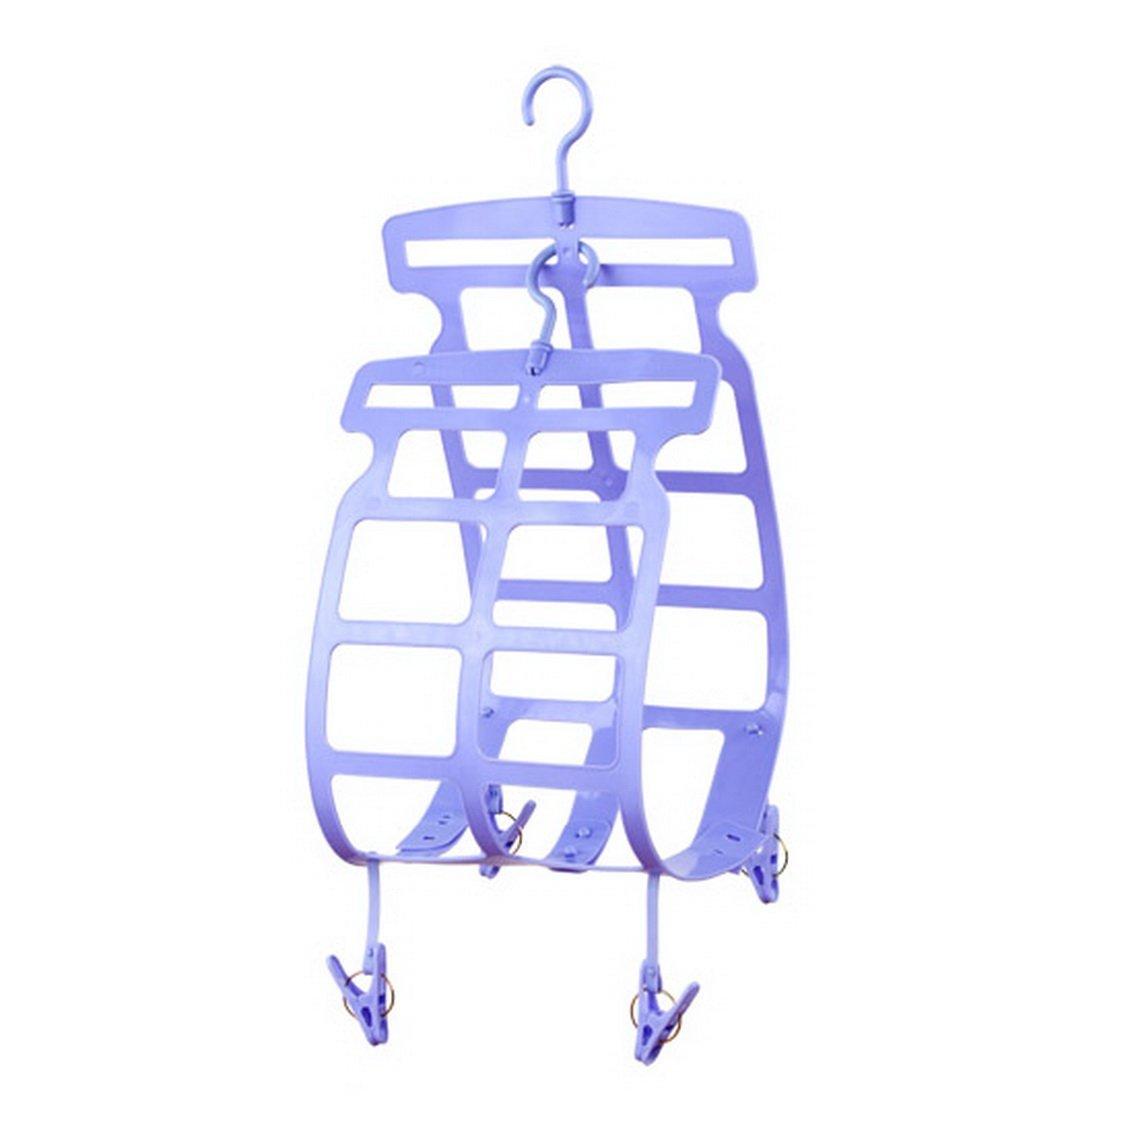 fengg2030shann Double hook pillow drying racks mini clip adjustable pillow toys hang drying multi-purpose drying pillow rack. Pillows pillow pillow hangers toys pillow